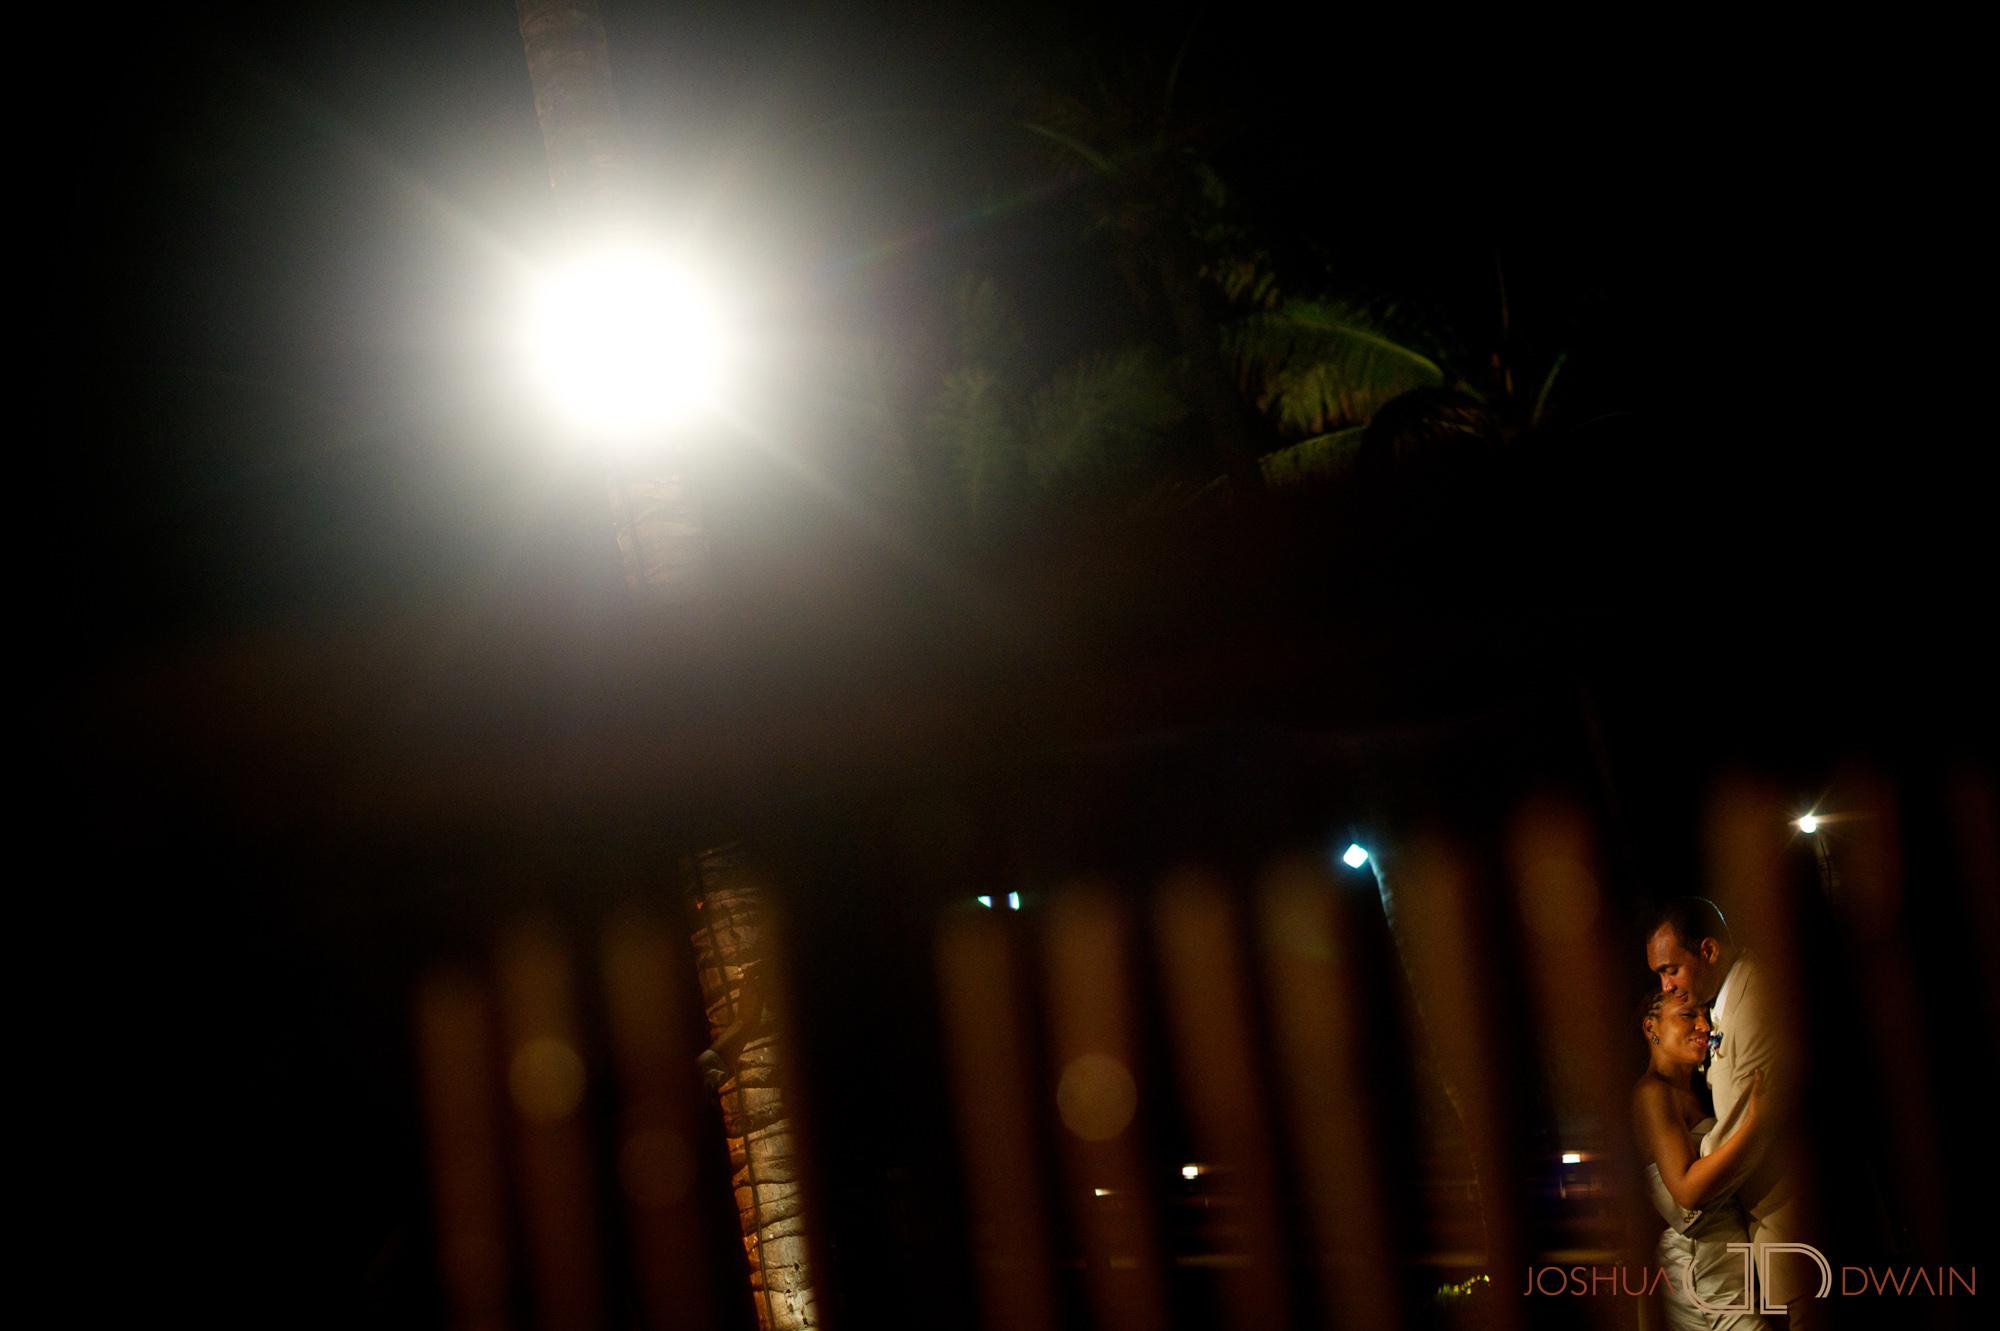 candra-alonza-019-holiday-inn-south-beach-miami-wedding-photographer-joshua-dwain-2012-07-28_ca_515